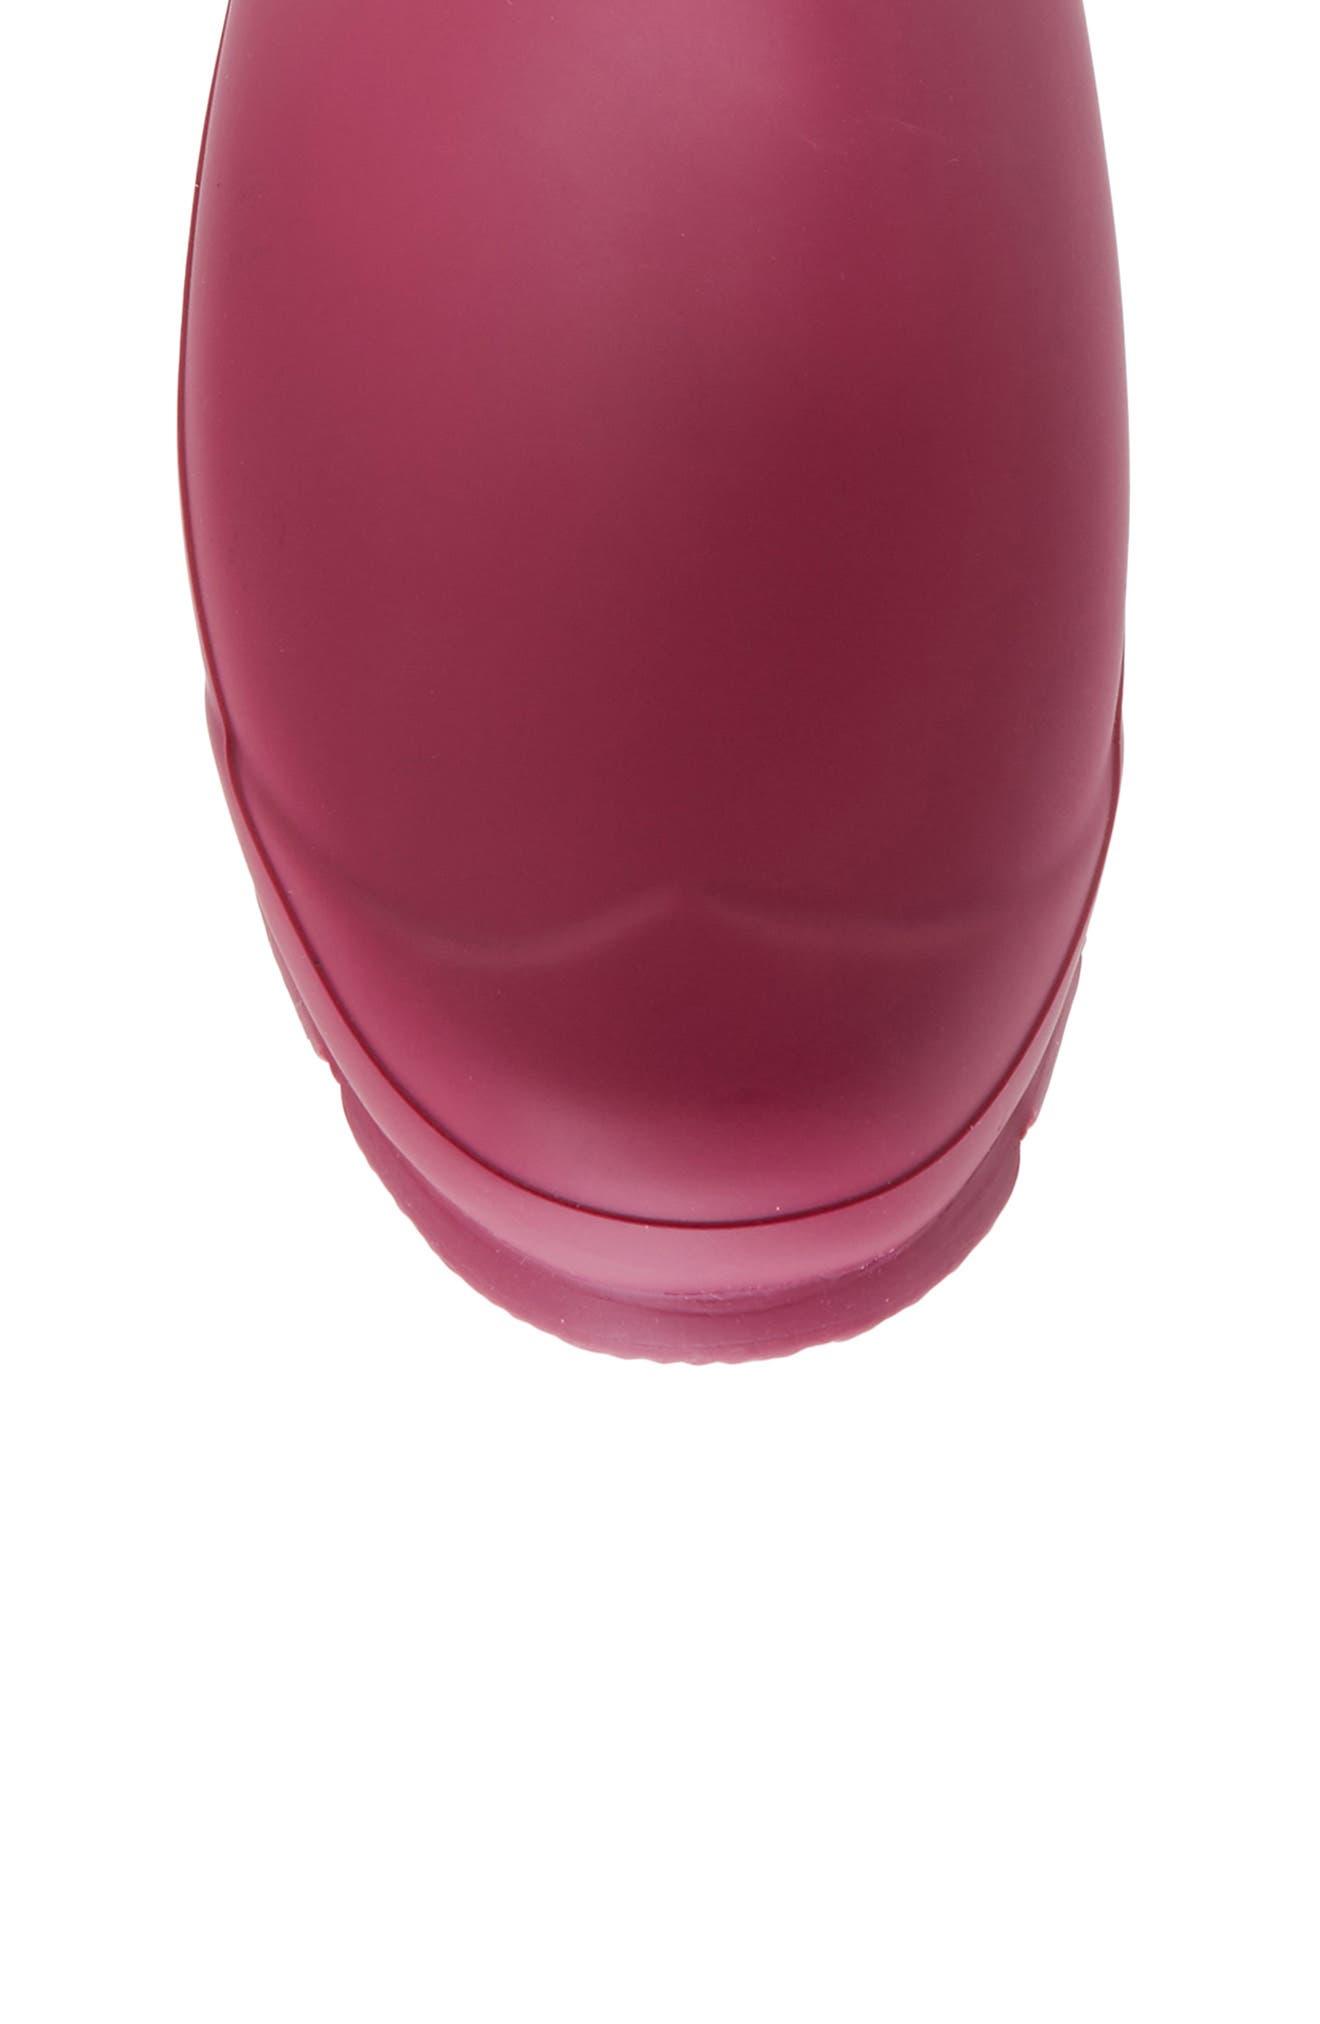 Adjustable Calf Rain Boot,                             Alternate thumbnail 5, color,                             Dark Ion Pink/ Ion Pink